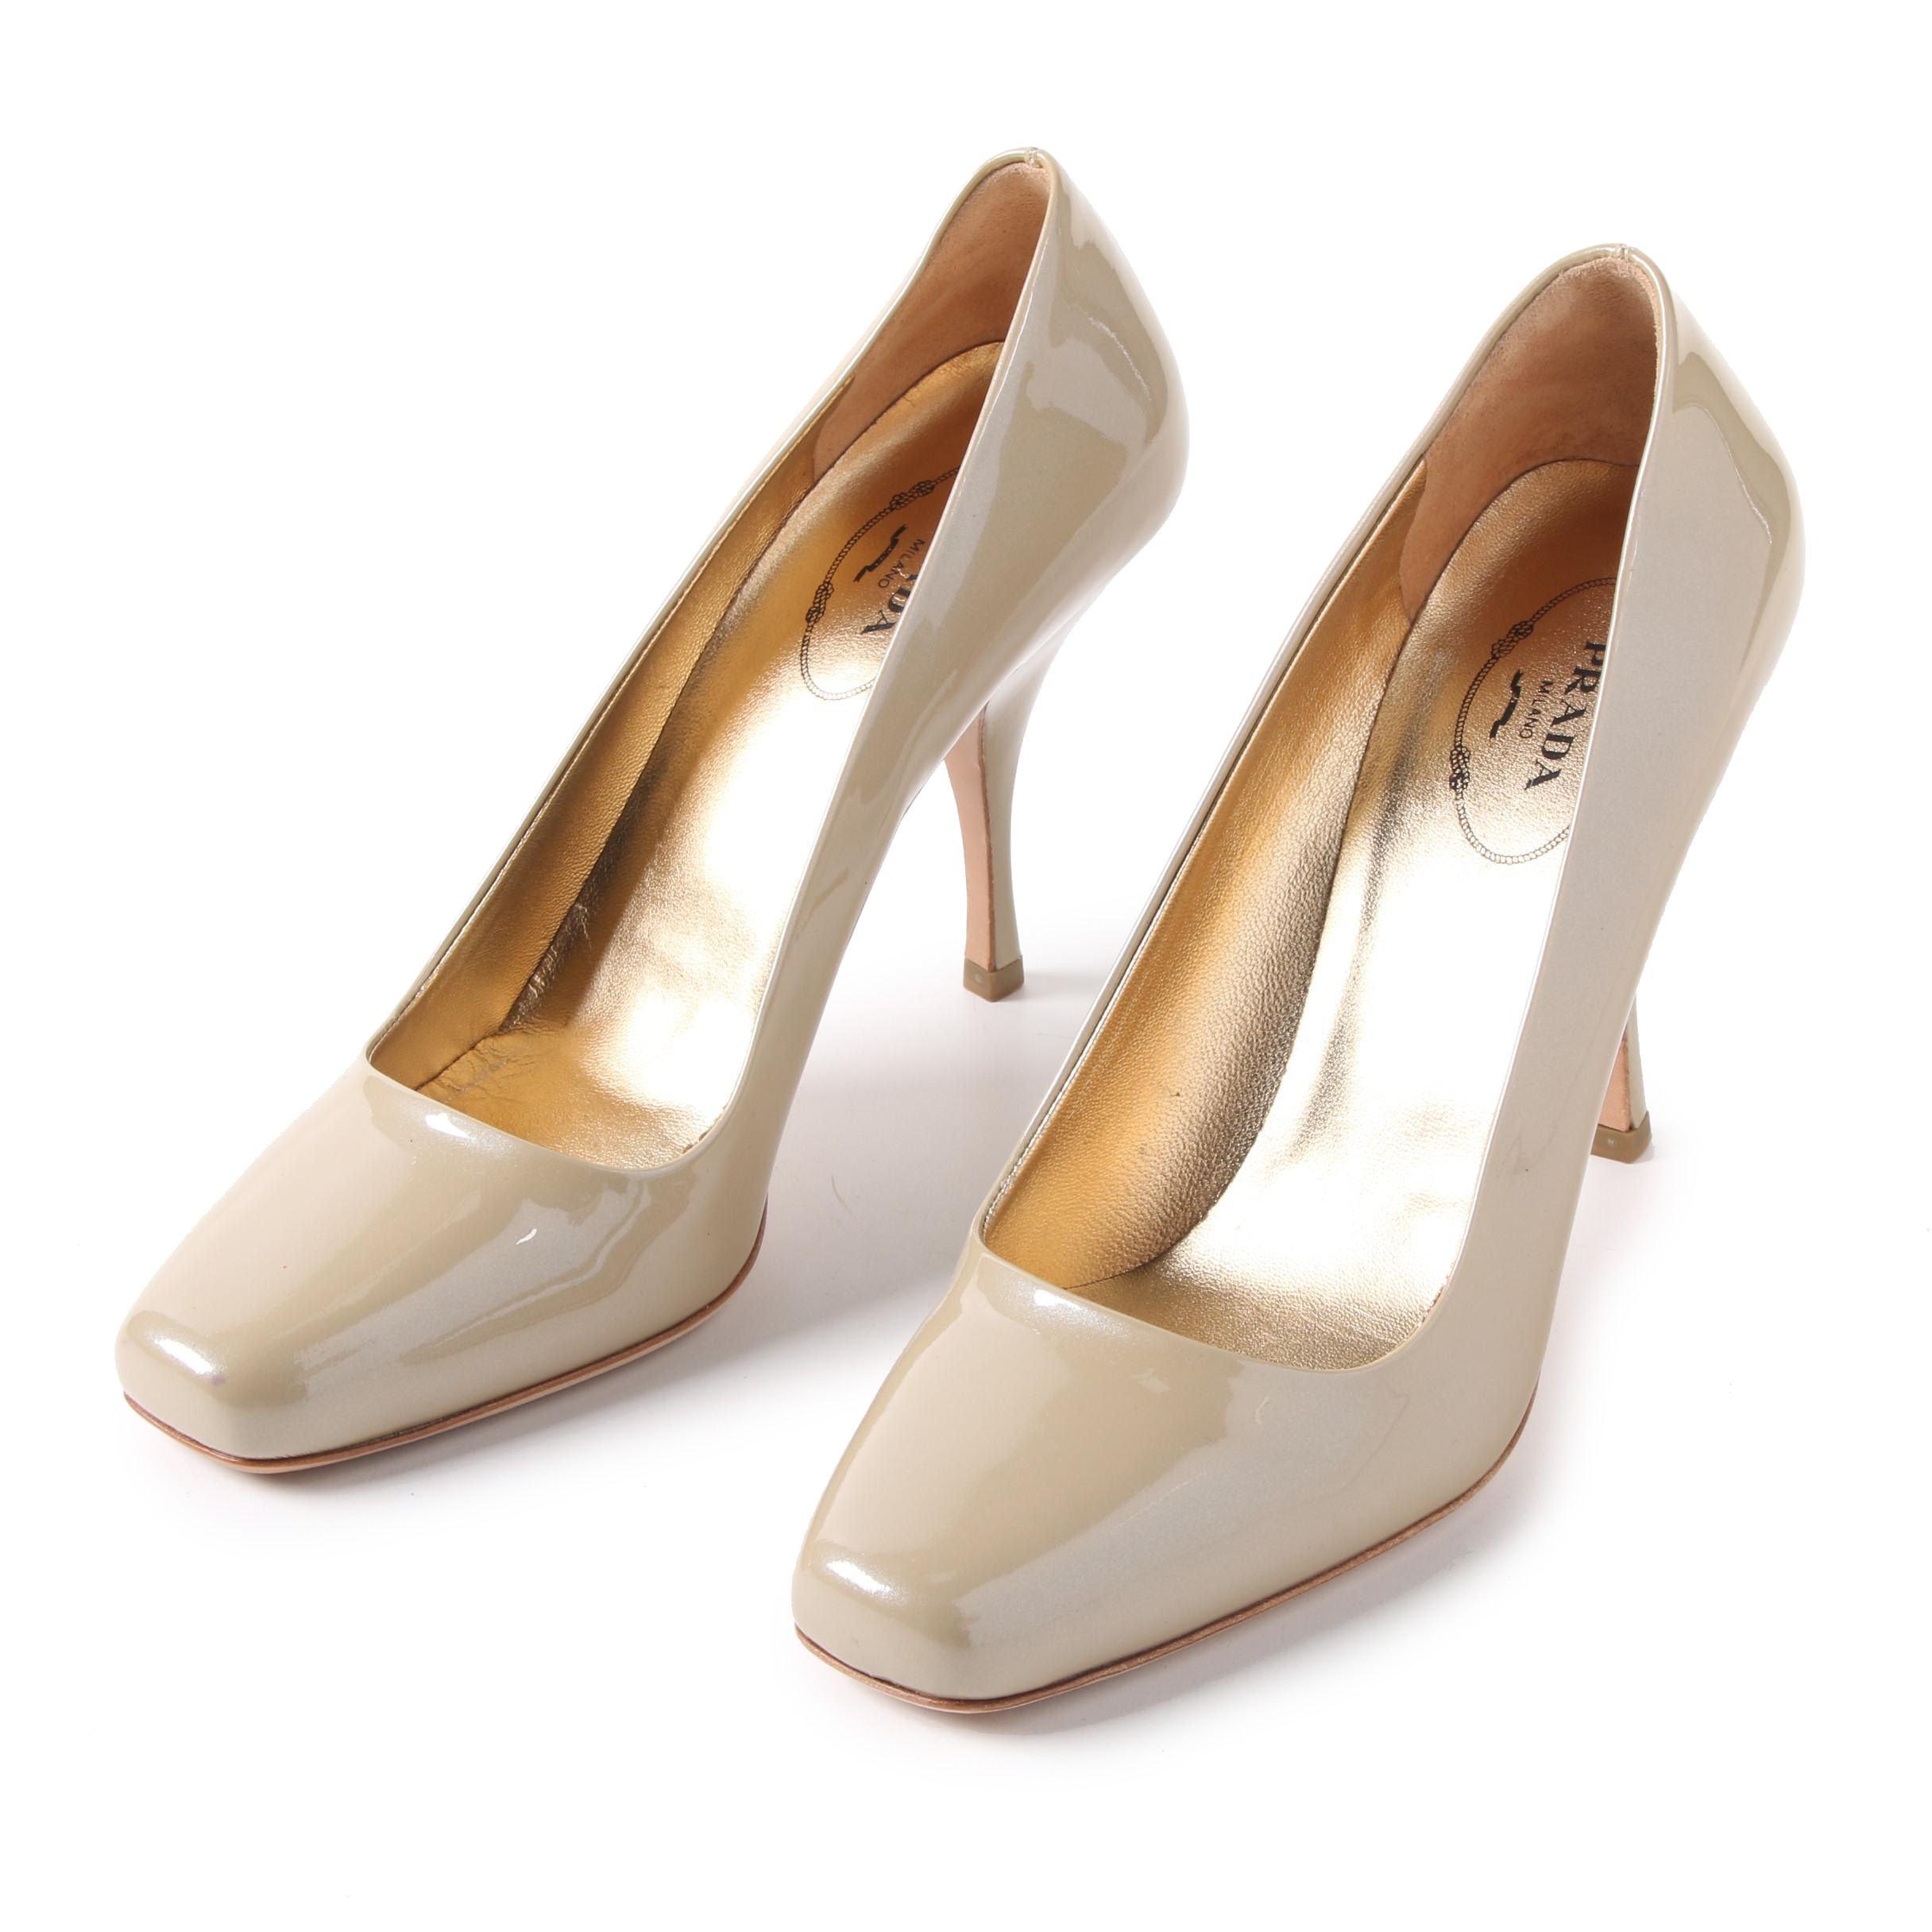 Prada Vernice Taffeta Cammello Patent Leather Square Toe Pumps